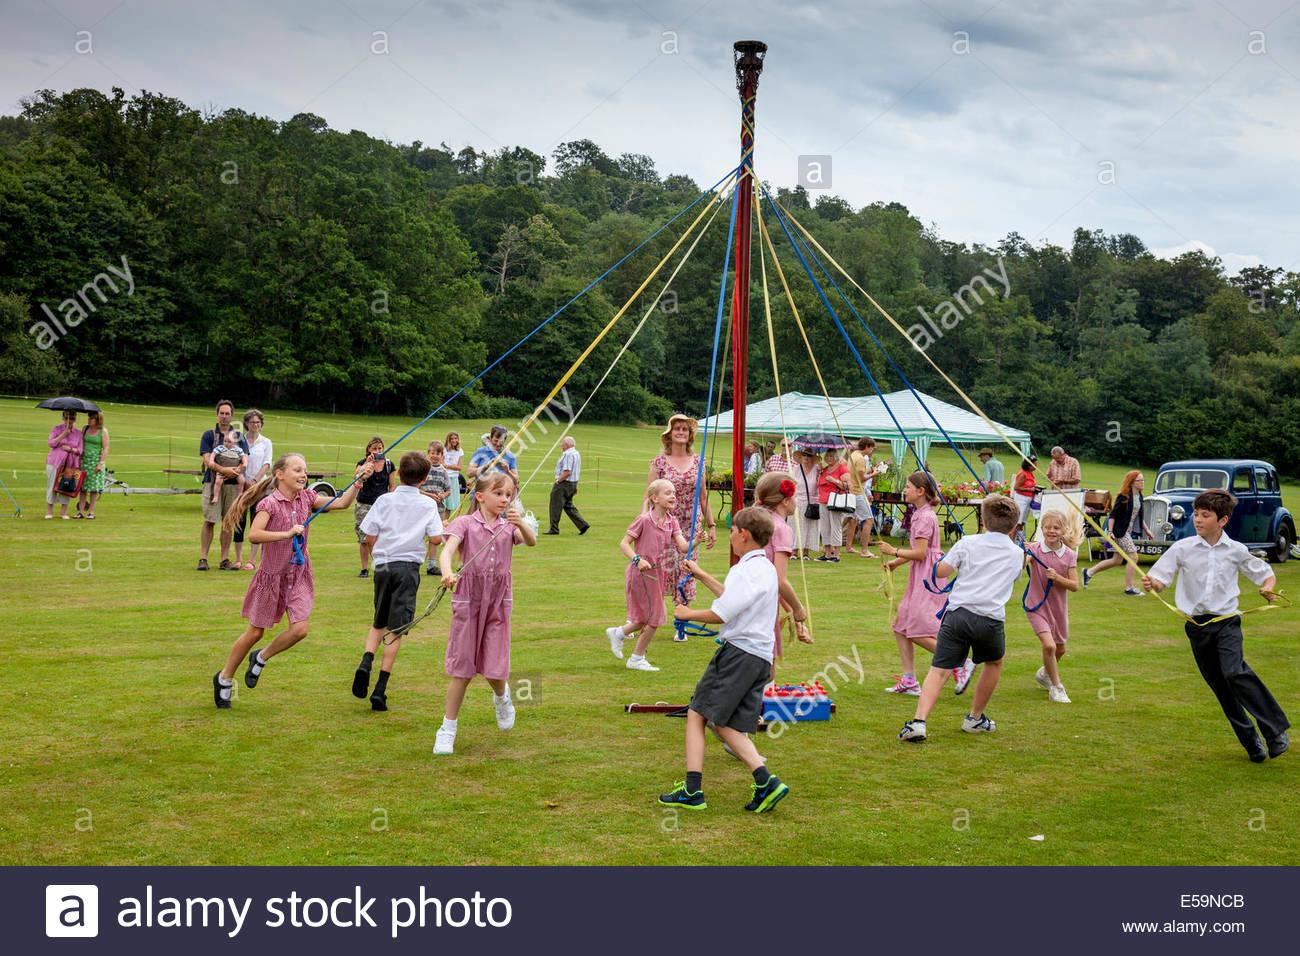 Maypole Dancing, Withyham Village Fete, Sussex, England - Stock Image